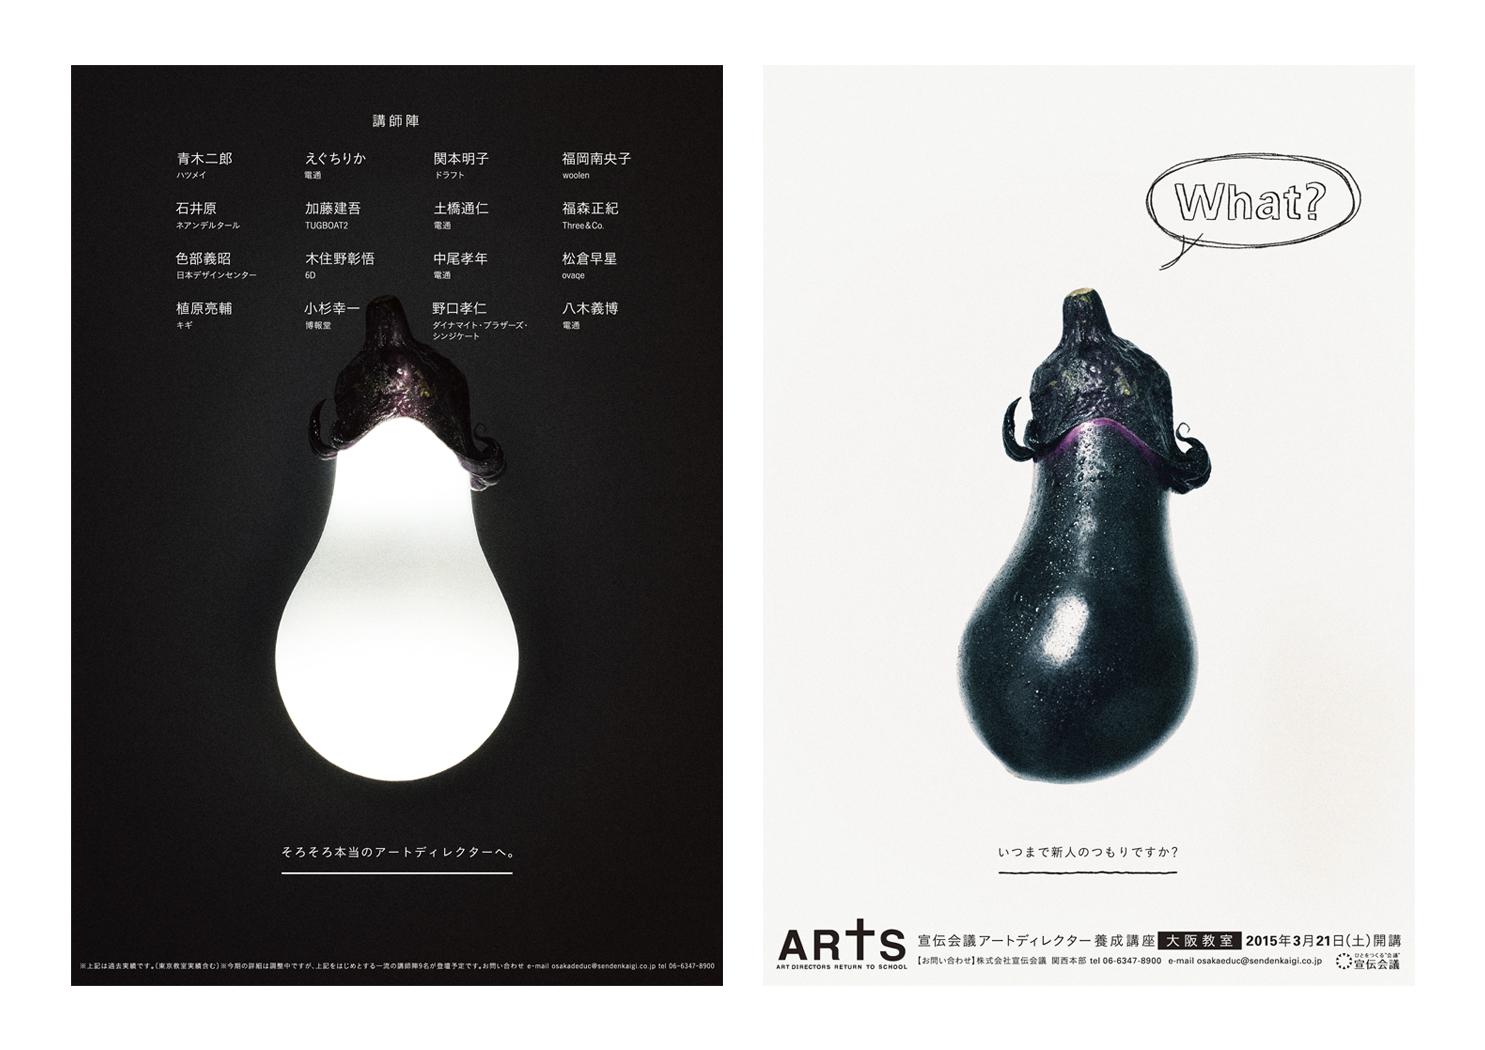 sendenkaigi ARTS 2015 Pamphlet